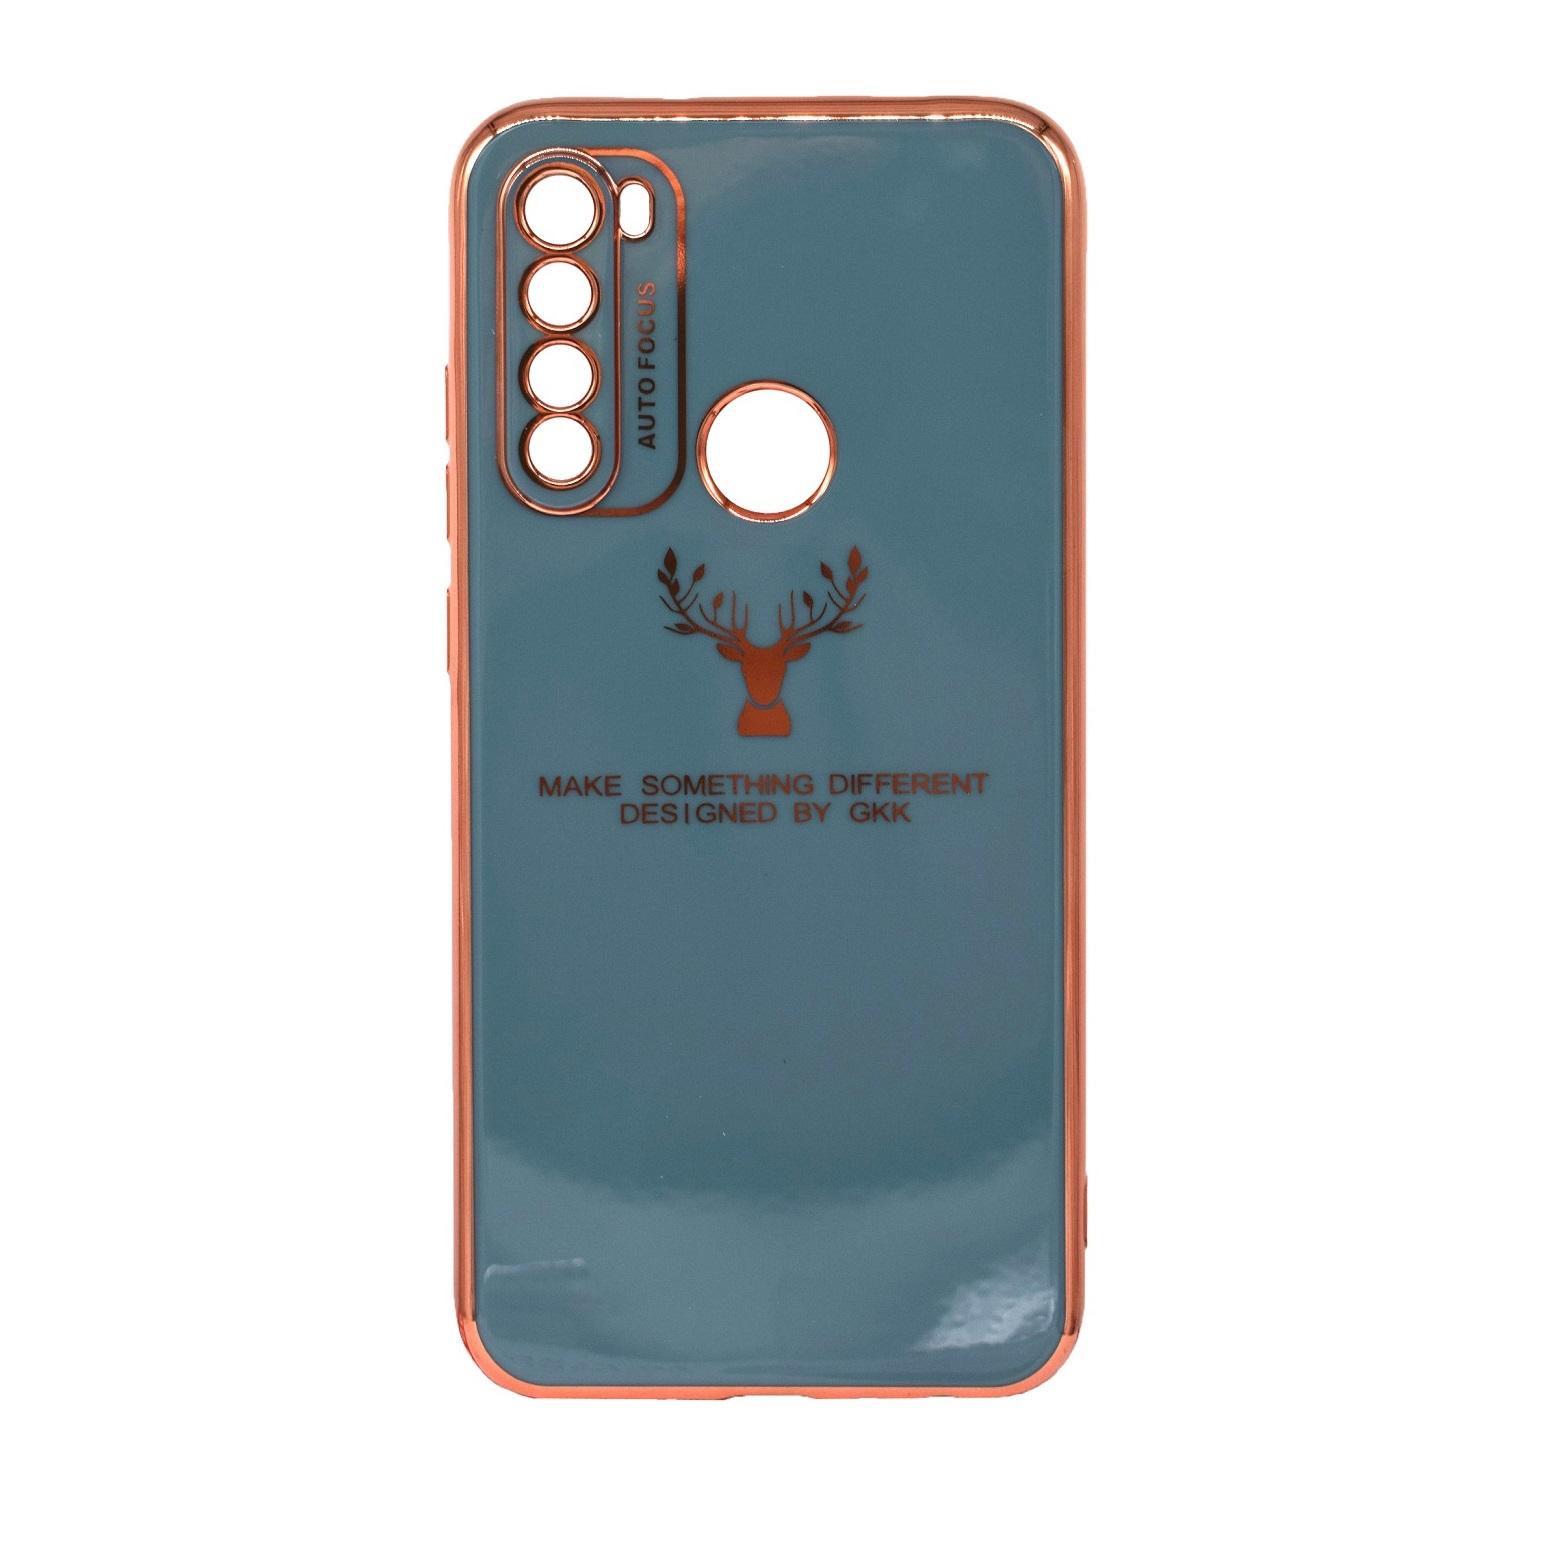 کاور جی کی کی مدل DT20 مناسب برای گوشی موبایل شیائومی Redmi Note 8